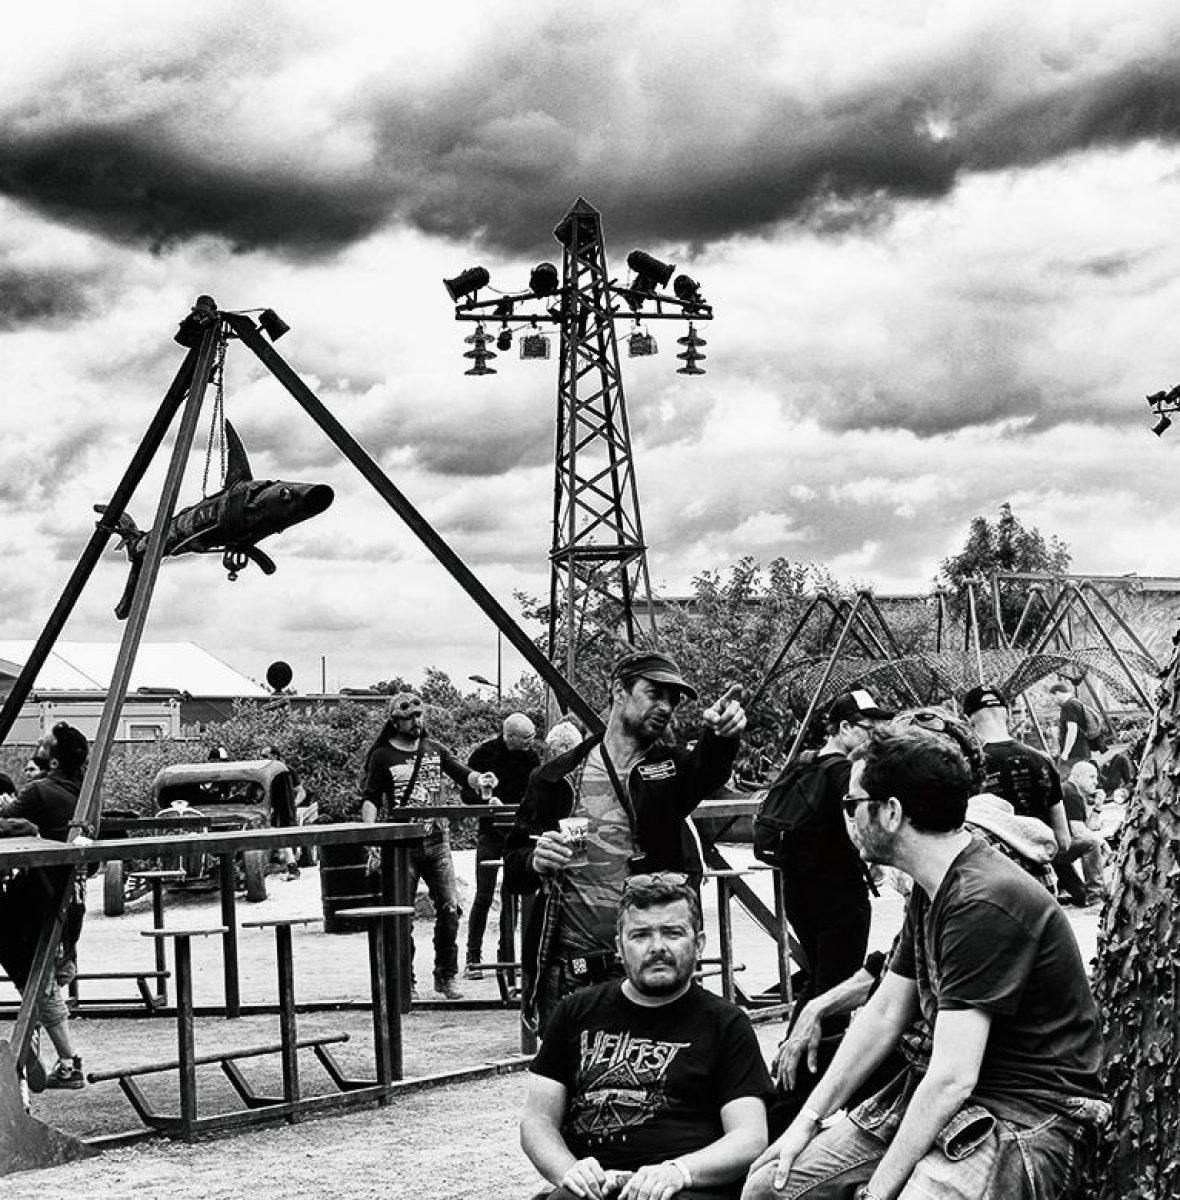 Madneom-Espace Vip Hellfest 2016 – Comptoir Pyramide – Copie